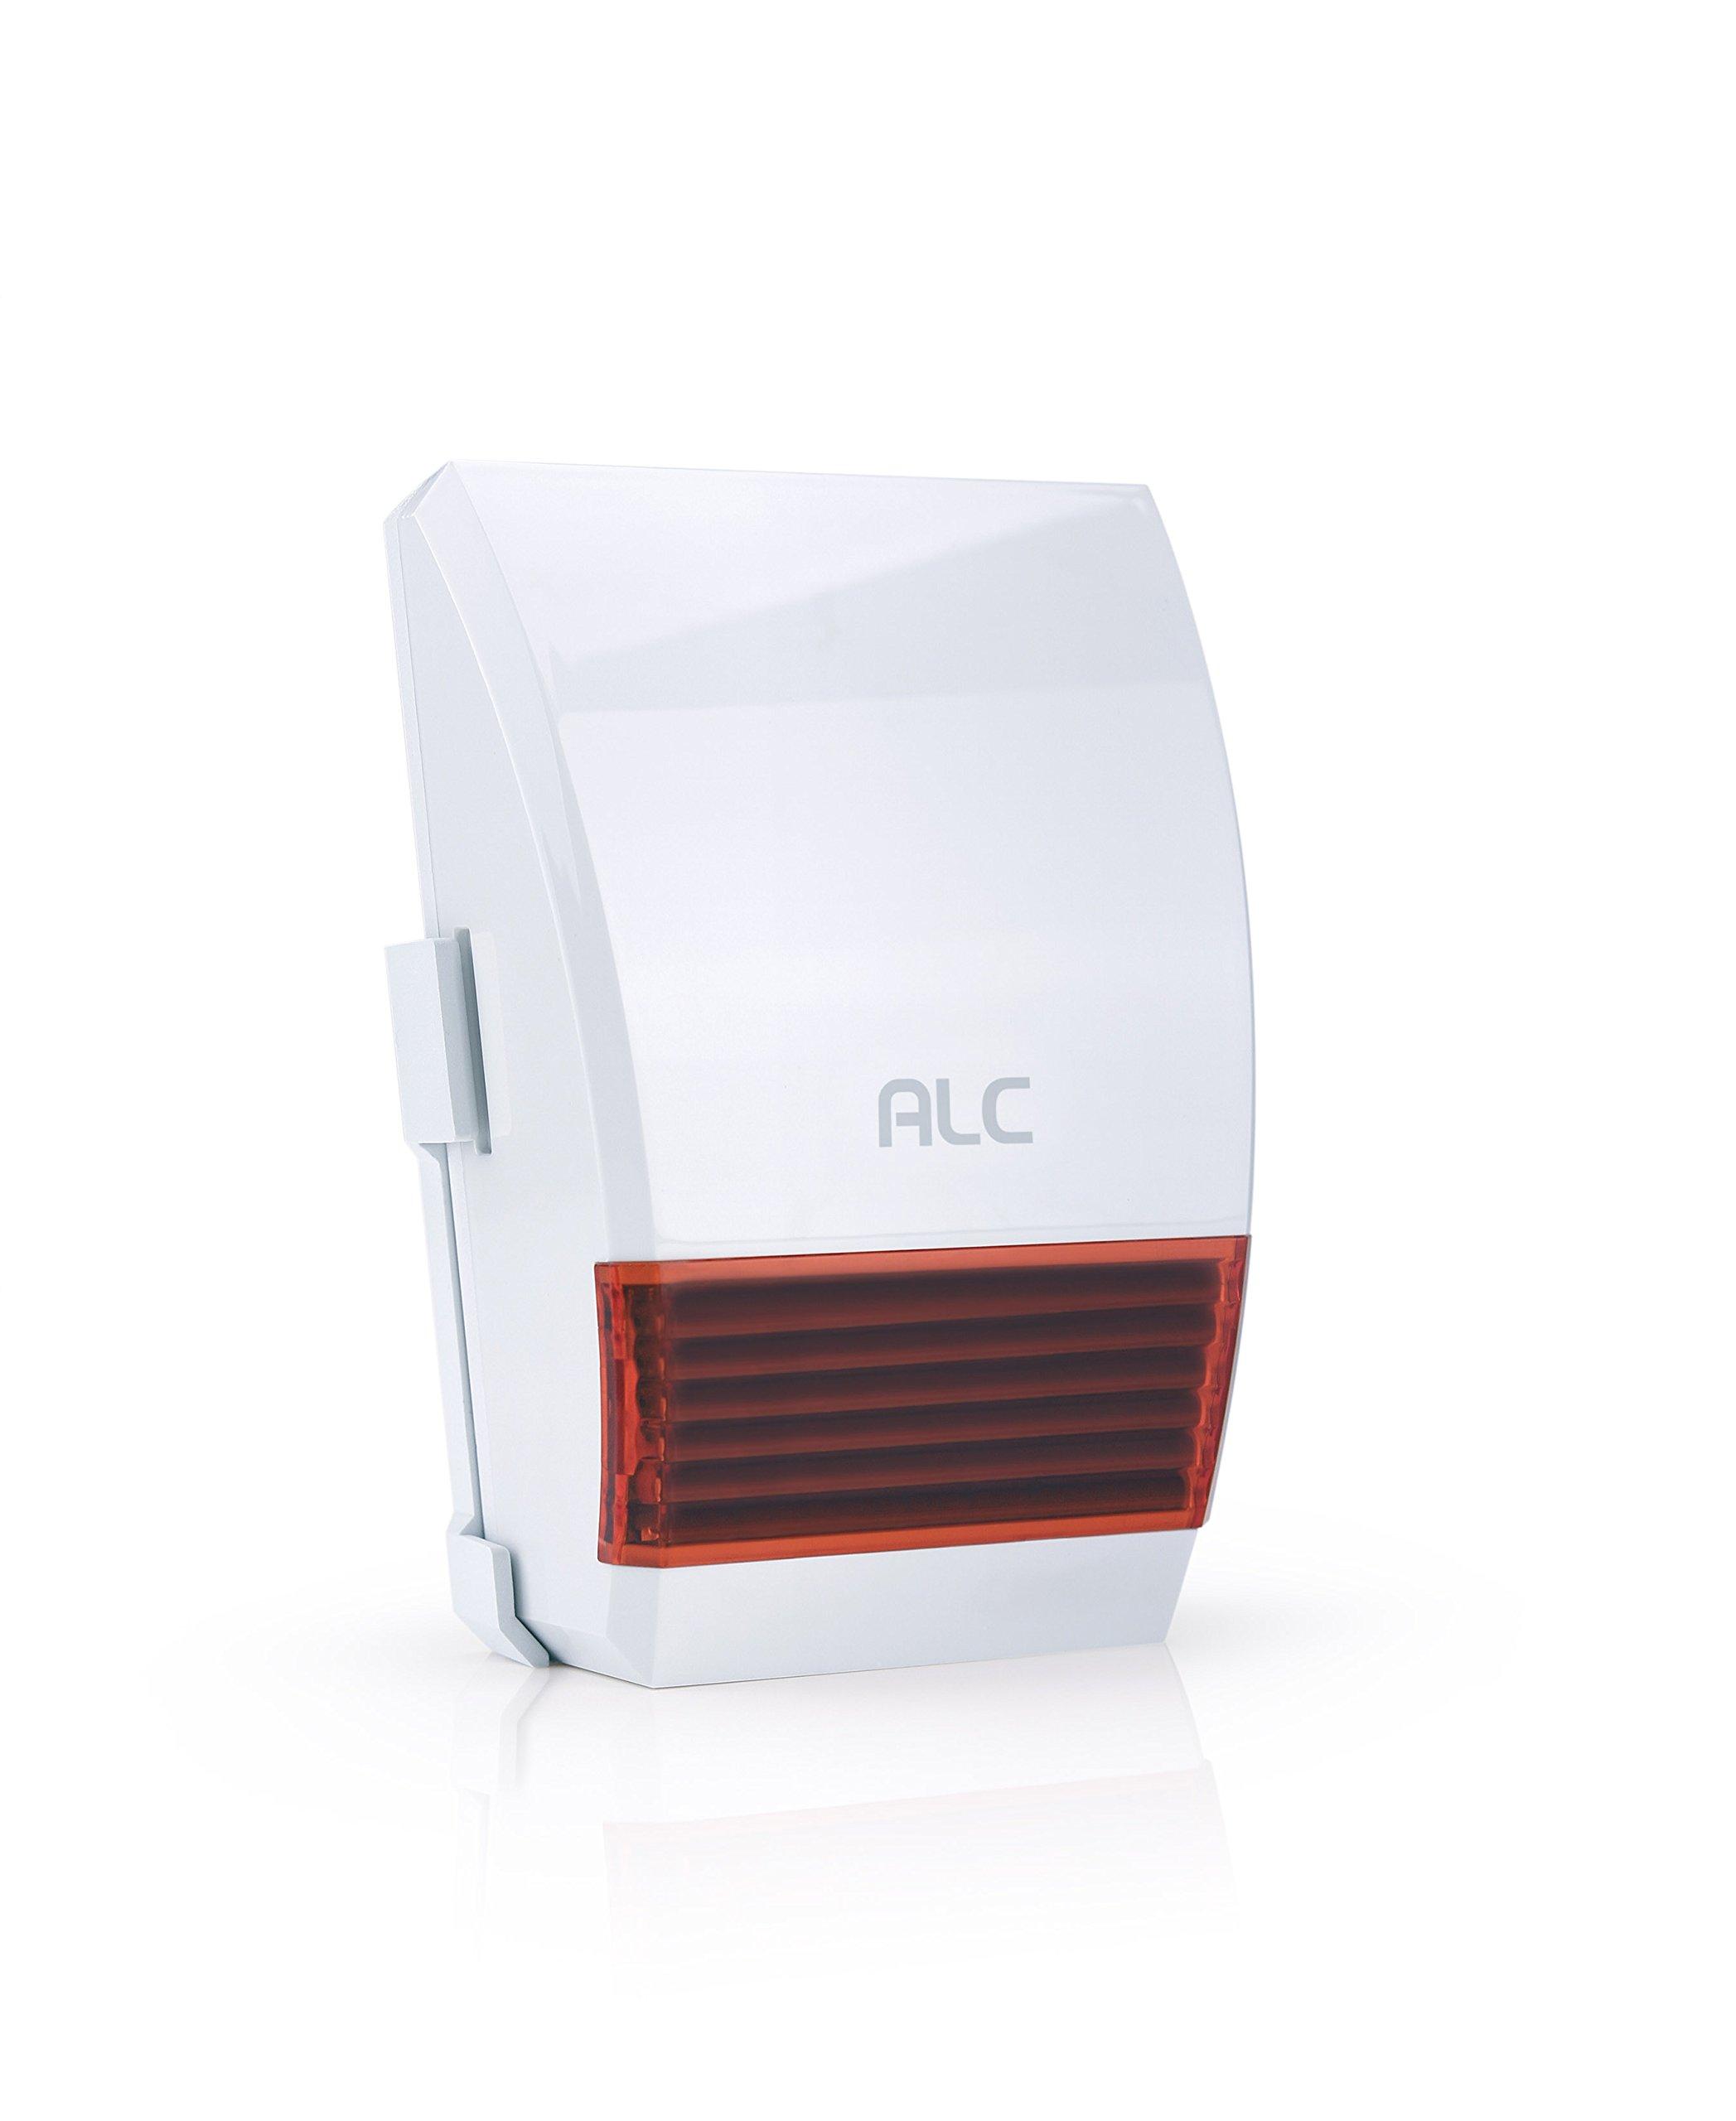 ALC AHSS51 Connect Siren Accessory (White) by ALC